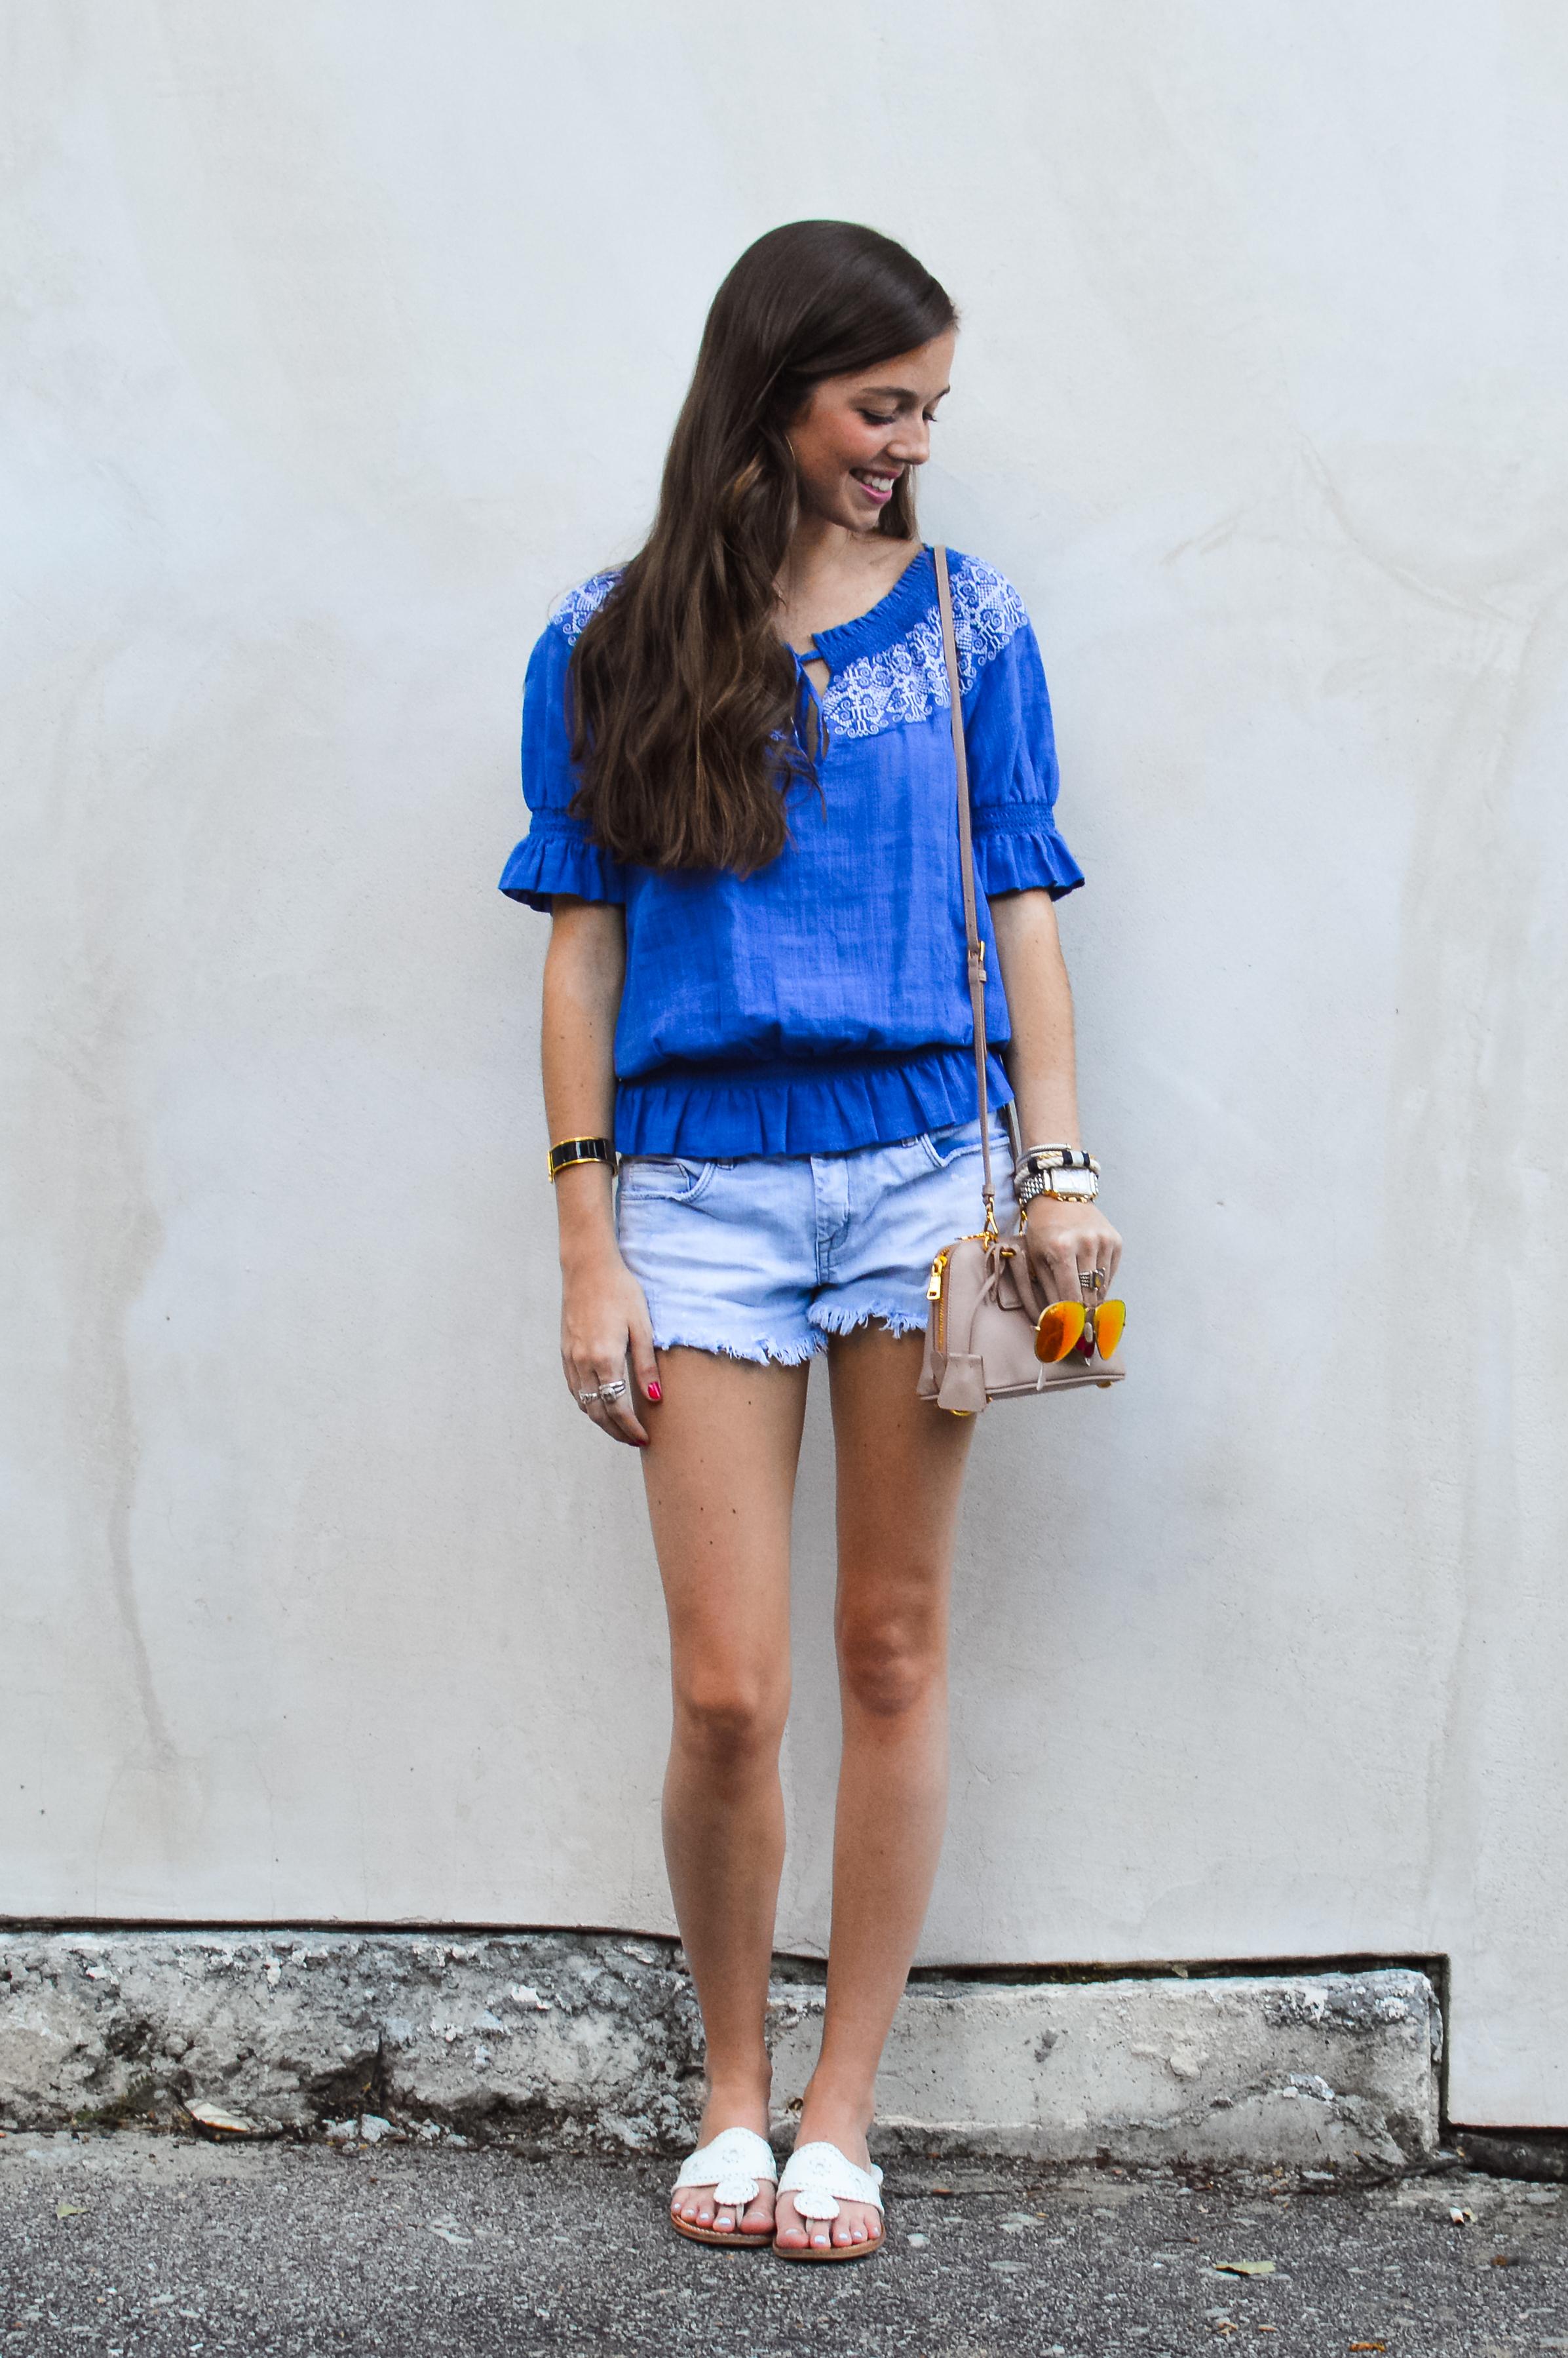 lcb_style_fashion_blogger_fourth of july (3 of 4).jpg